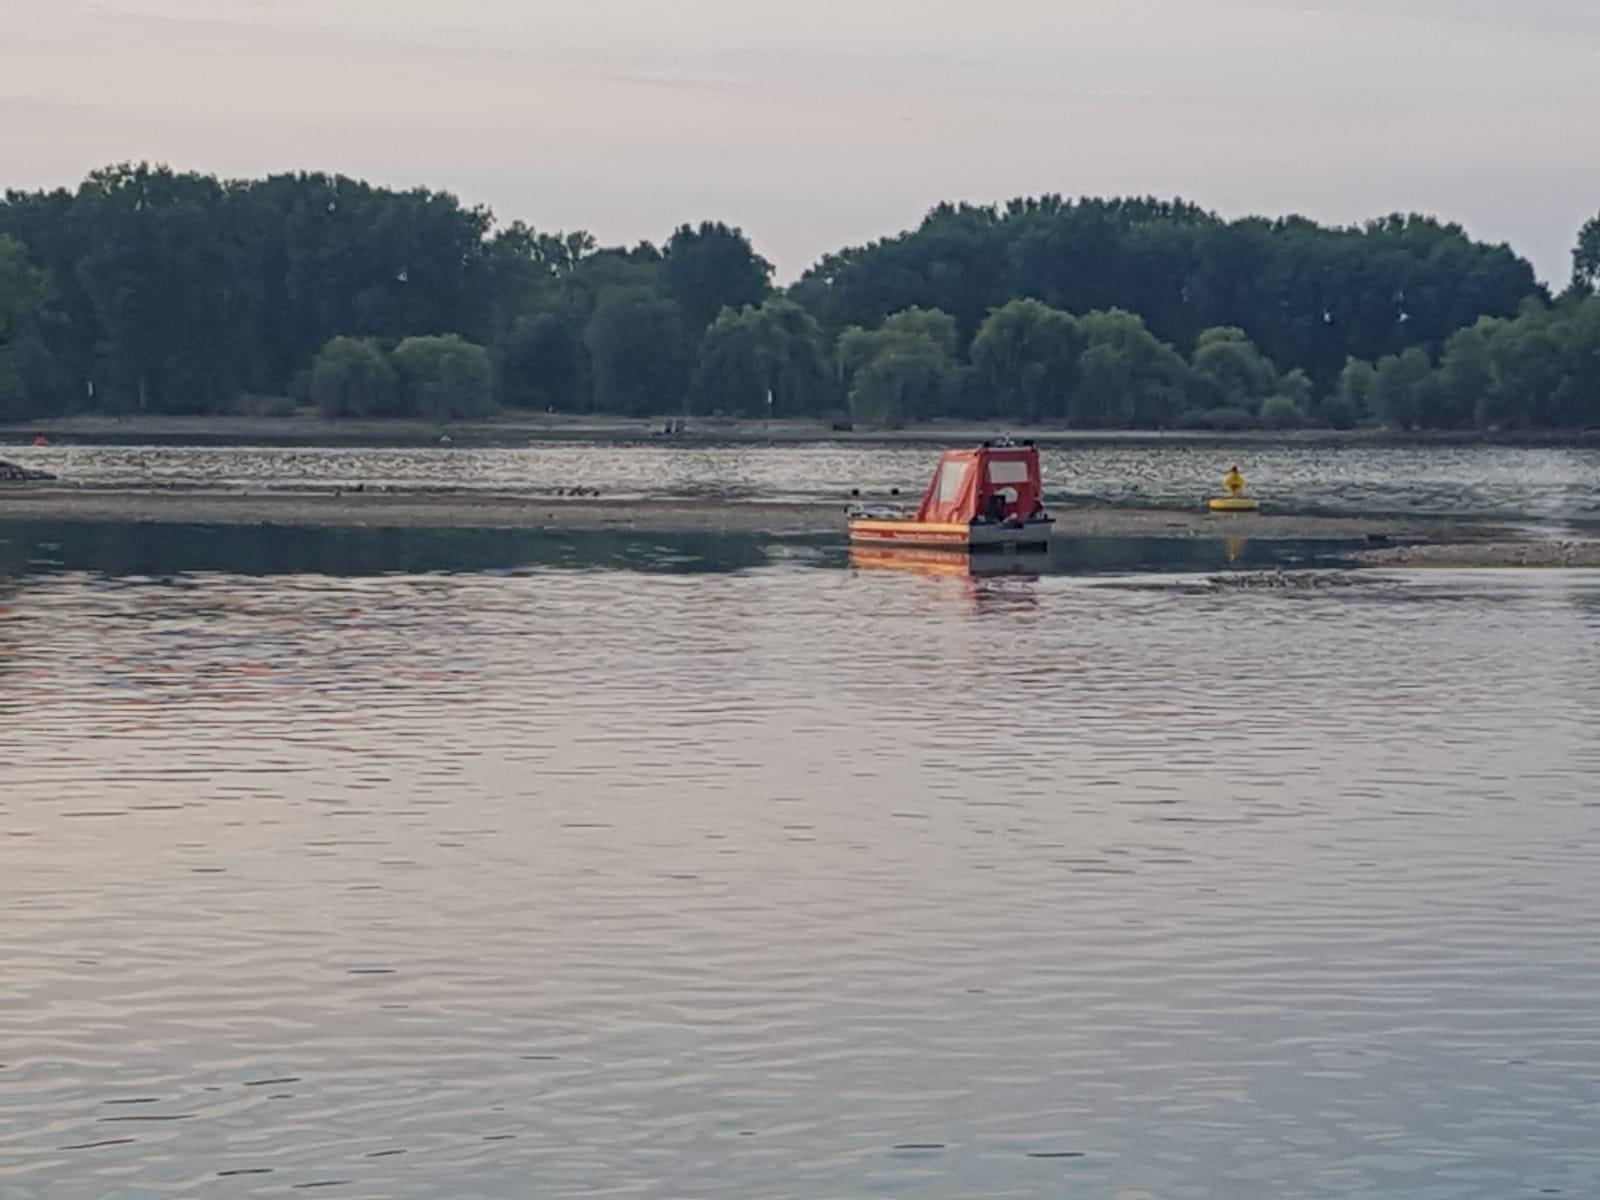 Diebe klauen Motor vom Feuerwehrboot in Oestrich-Winkel